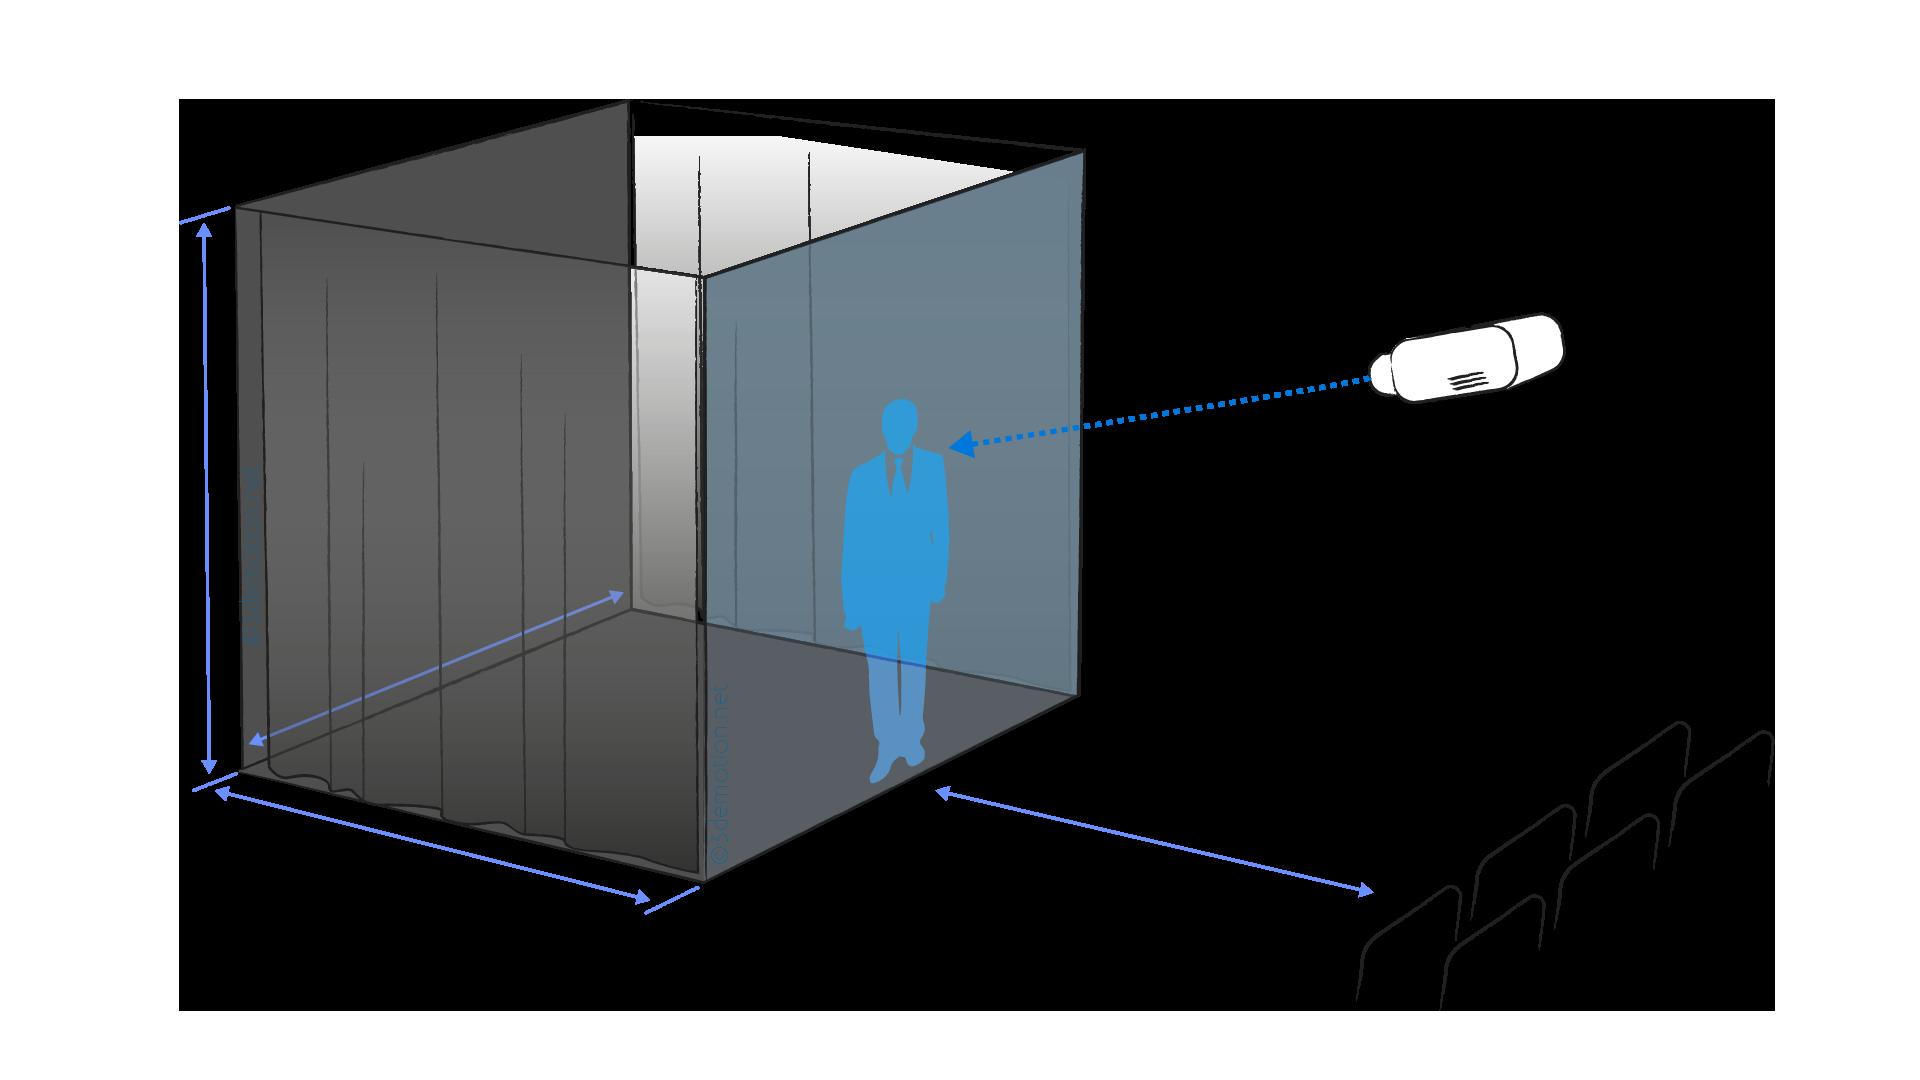 hologramme_3m_c